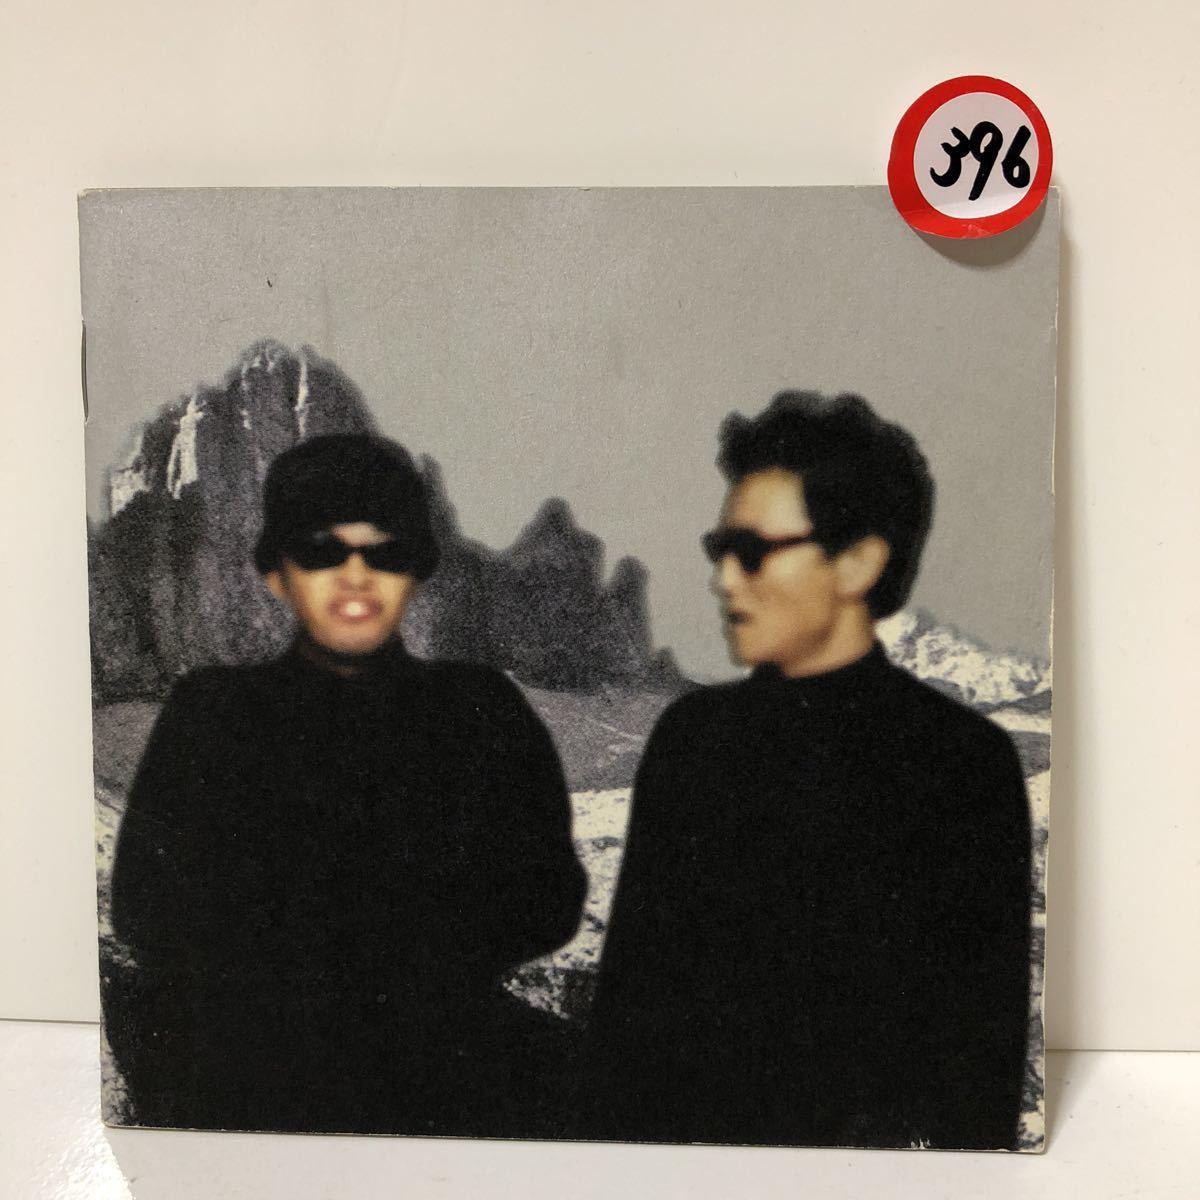 CD 蔵出し-396【Jポップ】(レンタルおち) ショッピング / 井上陽水.奥田民生_画像1